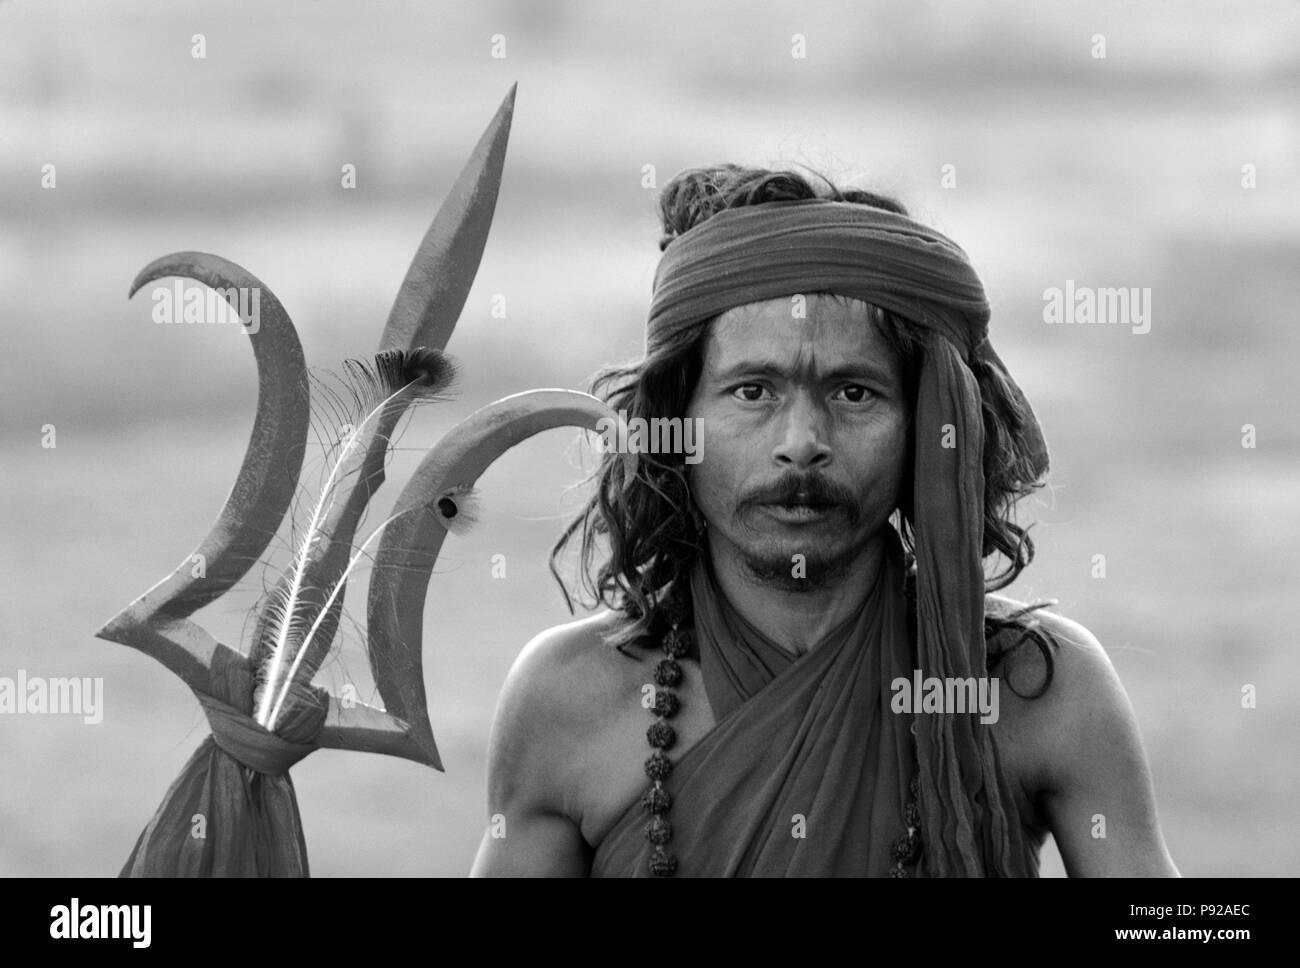 SHIVA worshipping HINDU SADDHU with TRIDENT at the PUSHKAR CAMEL FAIR, a 5 day religious festival - RAJASTHAN, INDIA - Stock Image